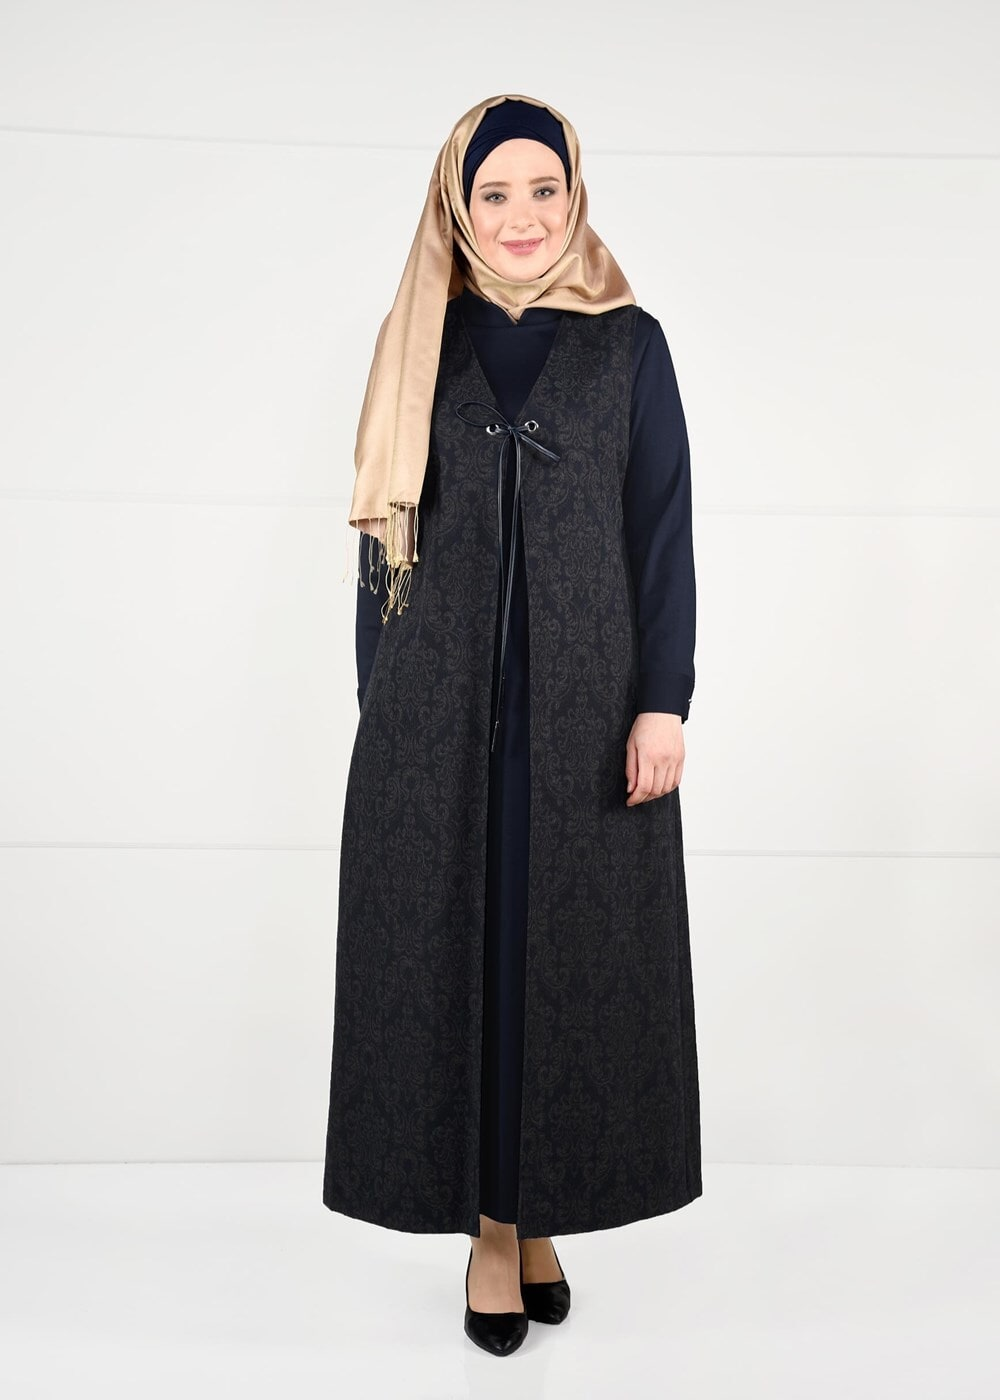 Female NAVY BLUE TIE-FRONT JAQUARD DRESS 3322